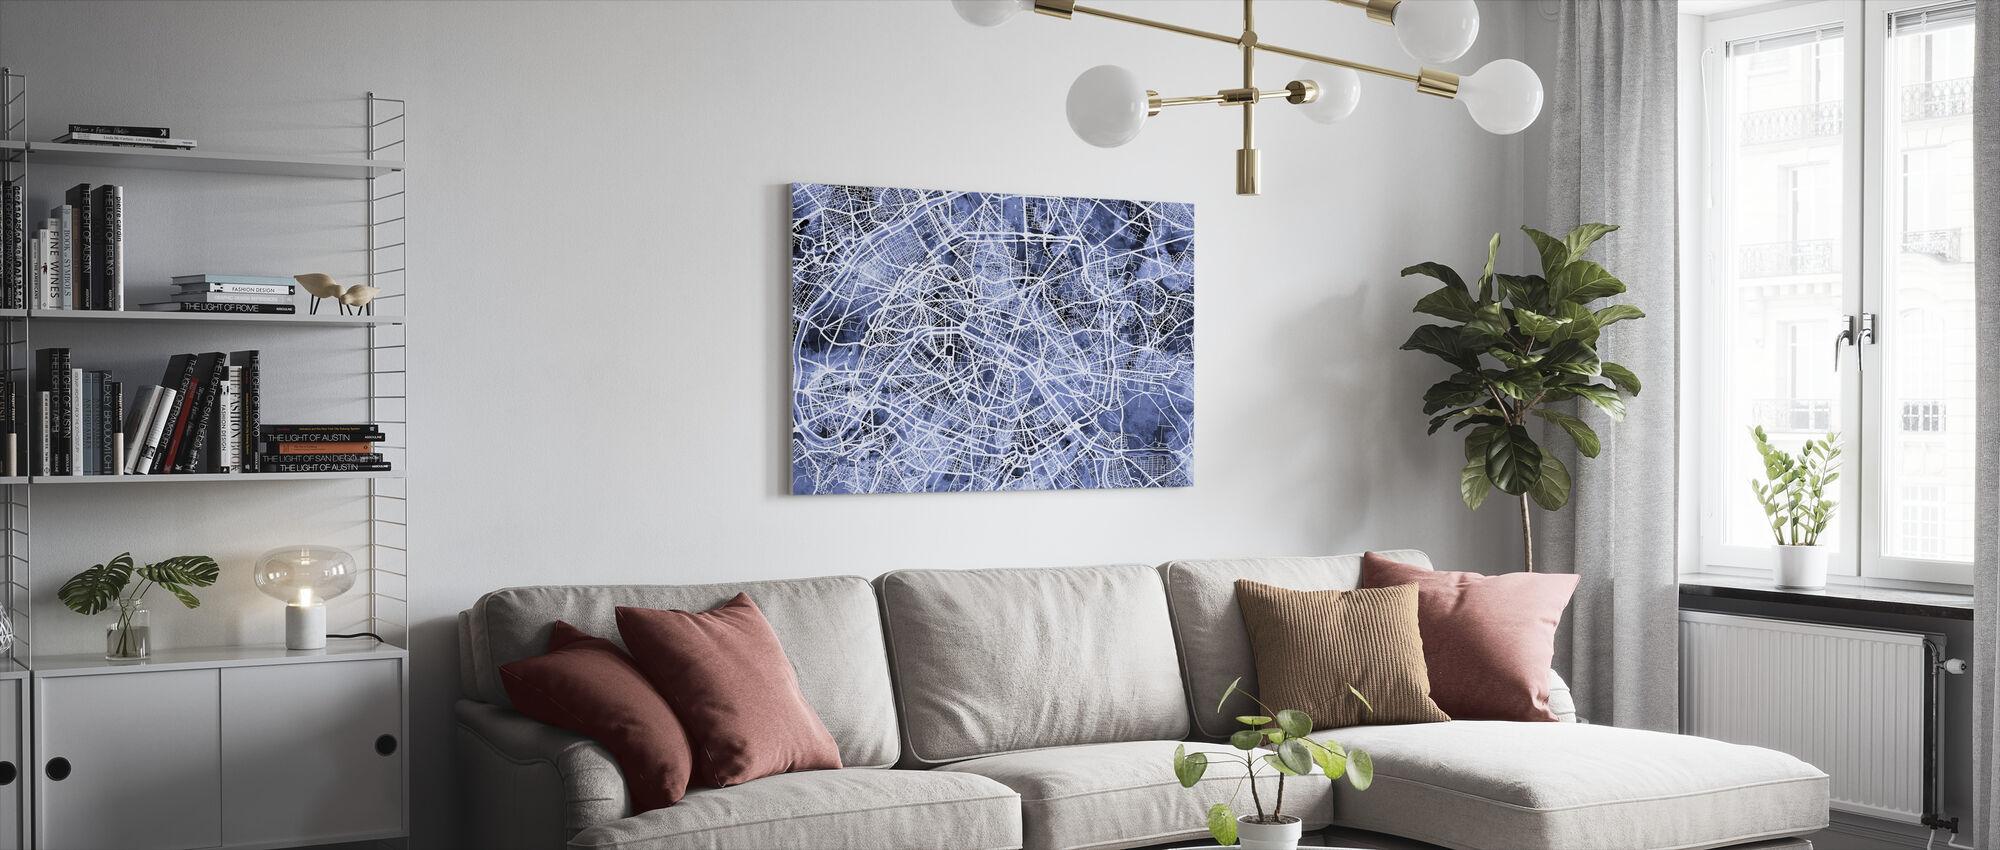 Paris France City Street Map - Canvas print - Living Room